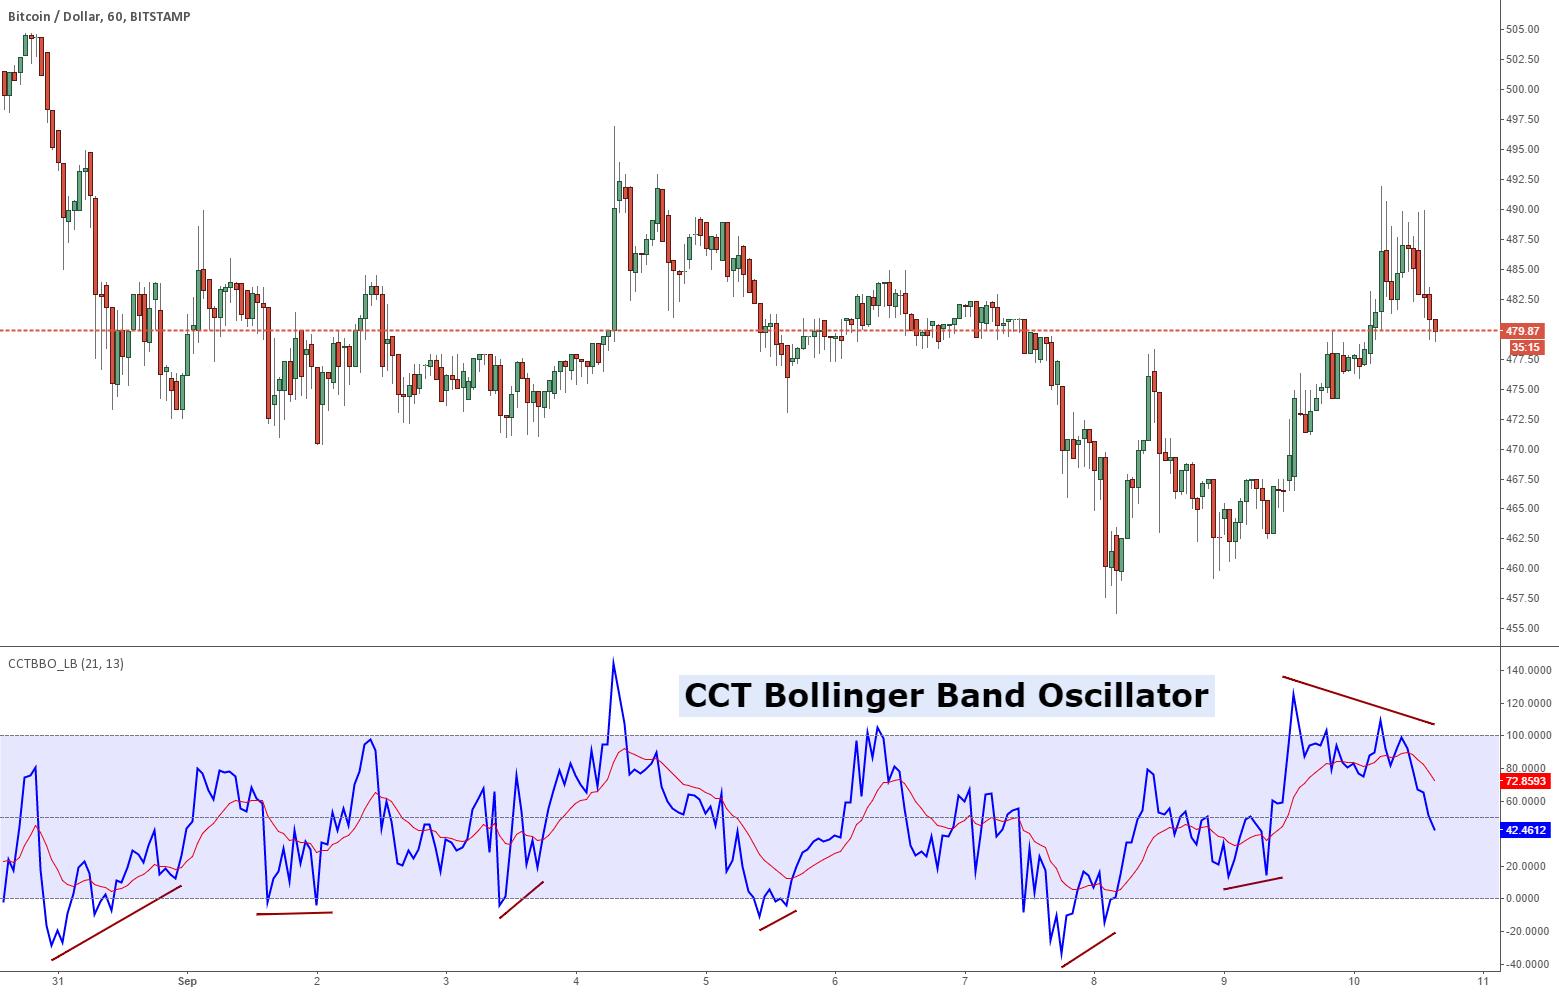 Cct bollinger bands oscillator